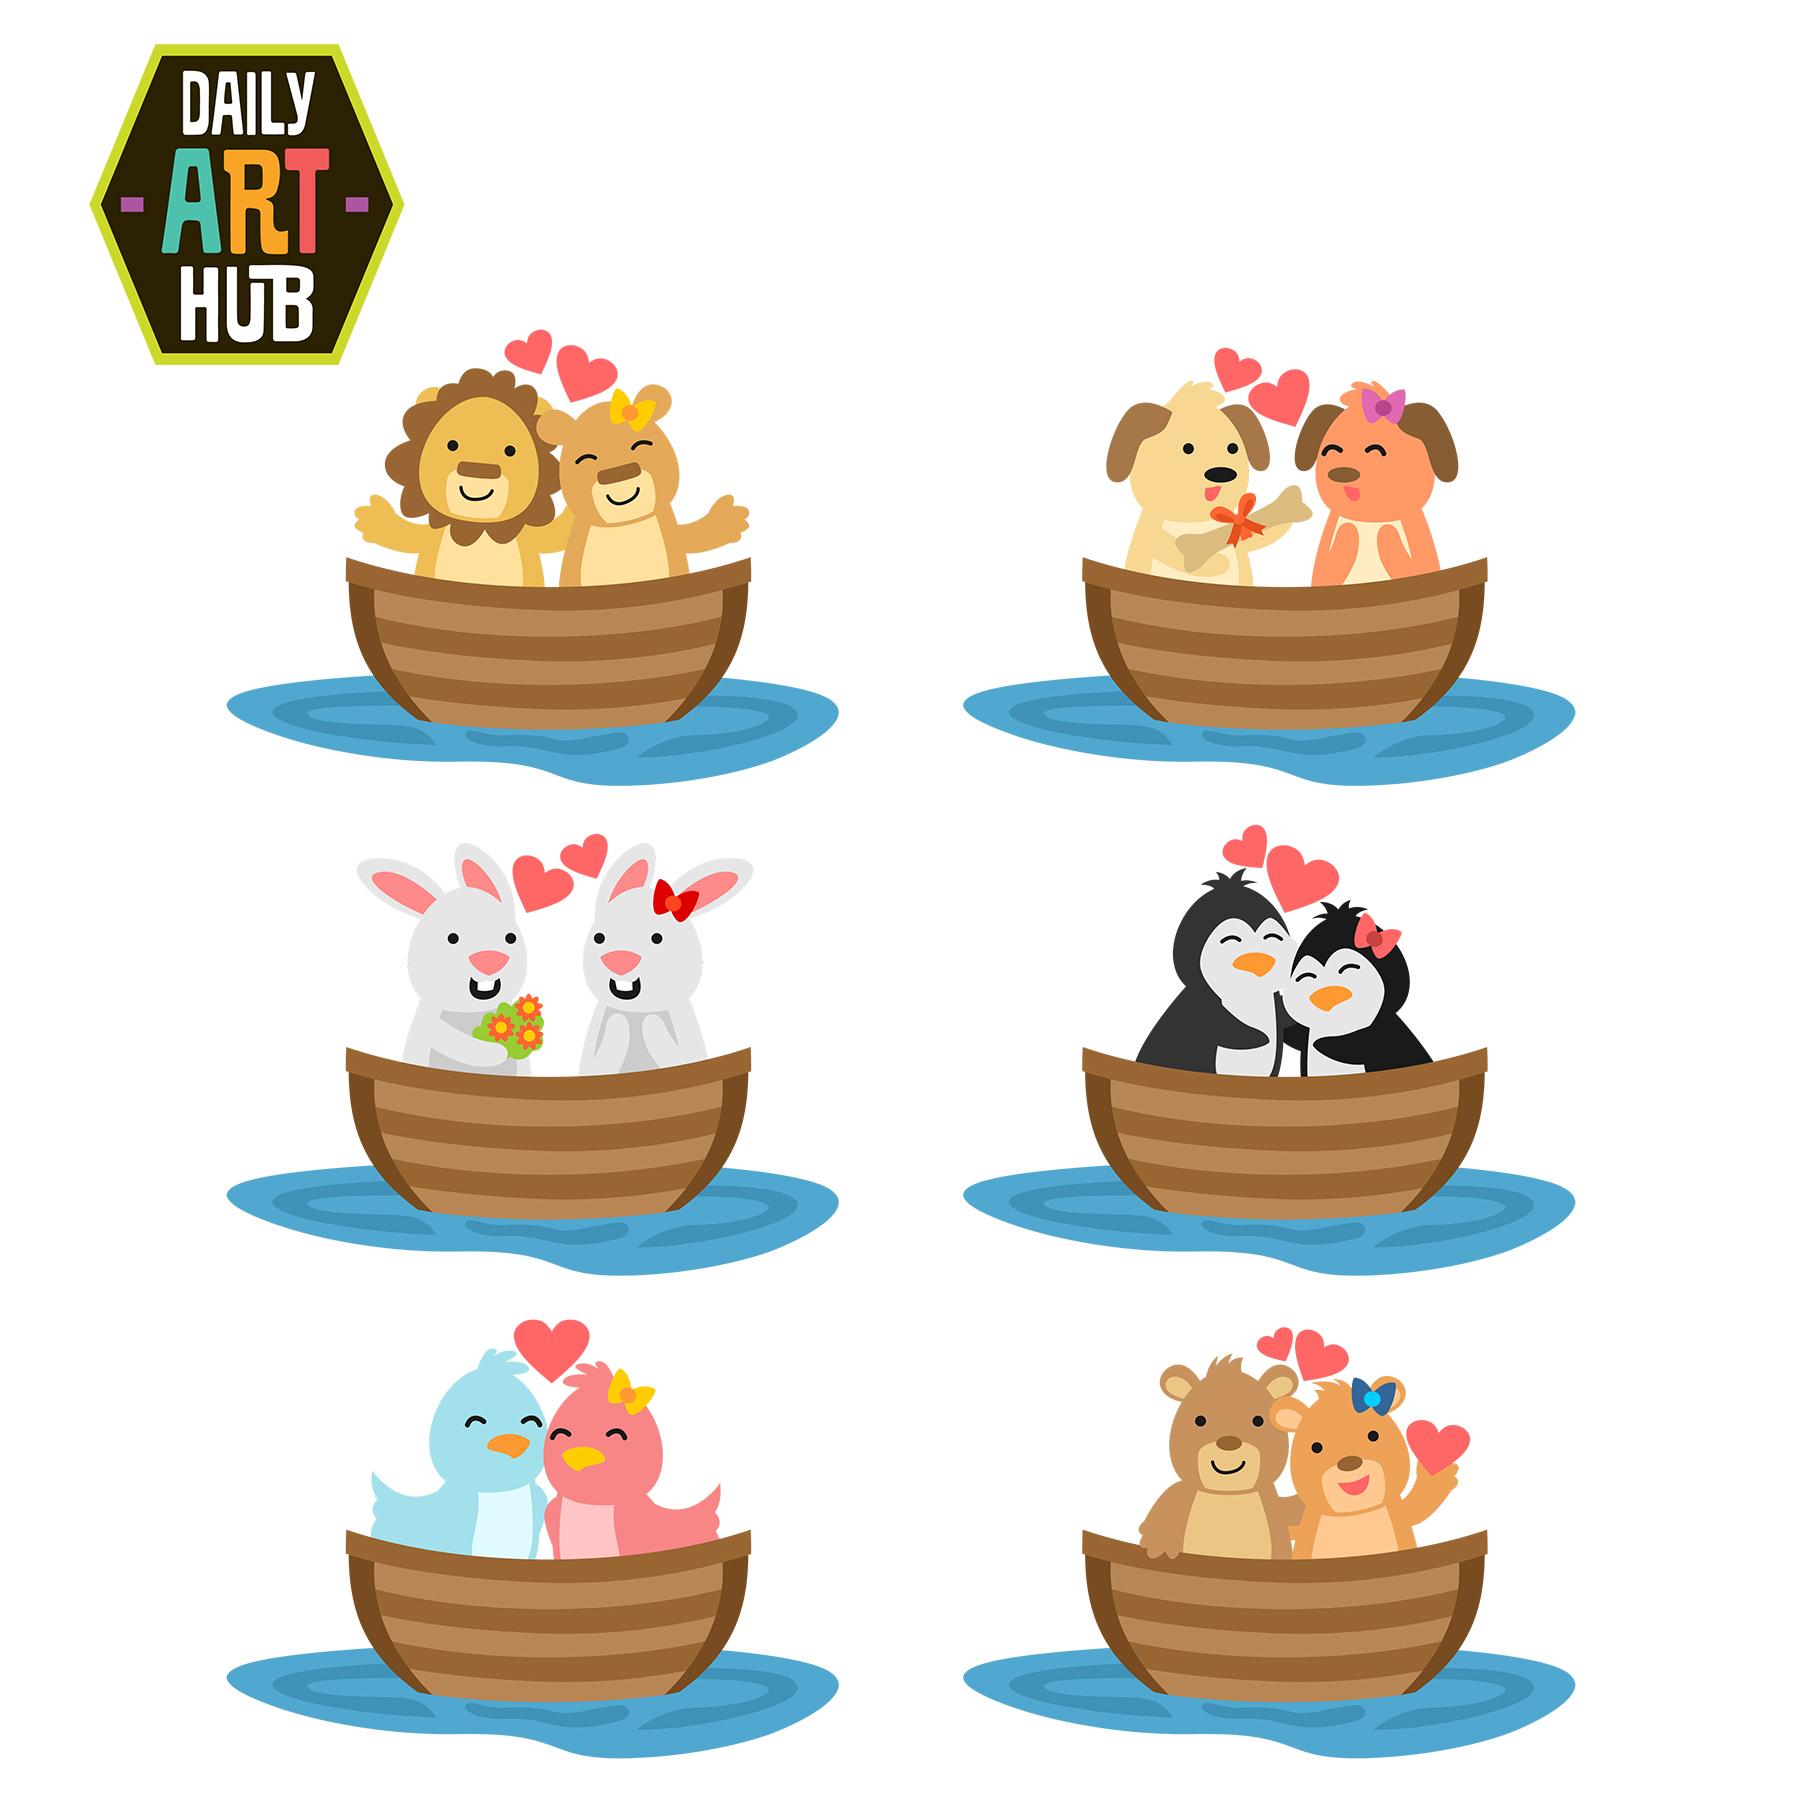 1800x1800 Love Boat Clip Art Set Daily Art Hub Free Clip Art Everyday